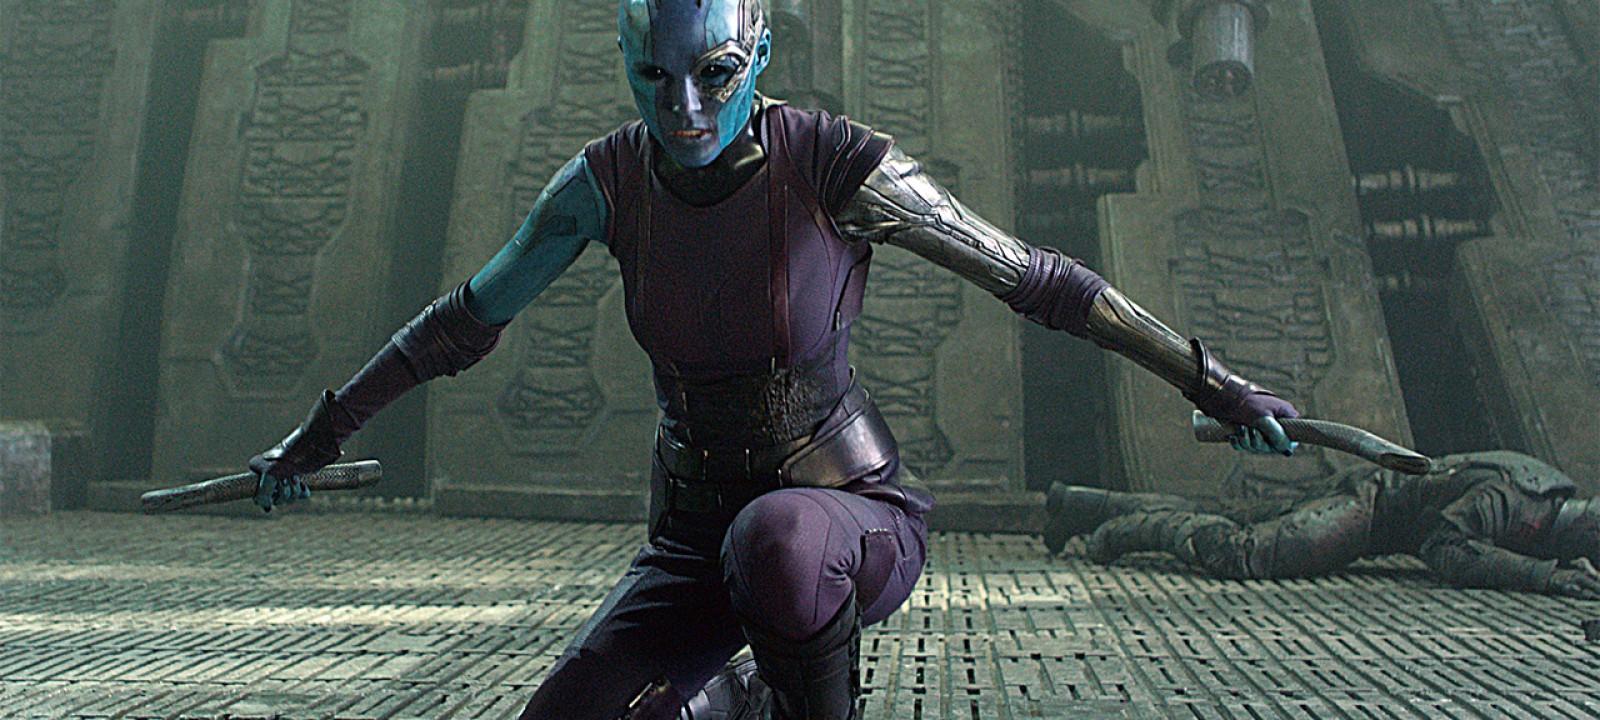 Karen Gillan as Nebula in 'Guardians of the Galaxy' (Photo: Marvel)